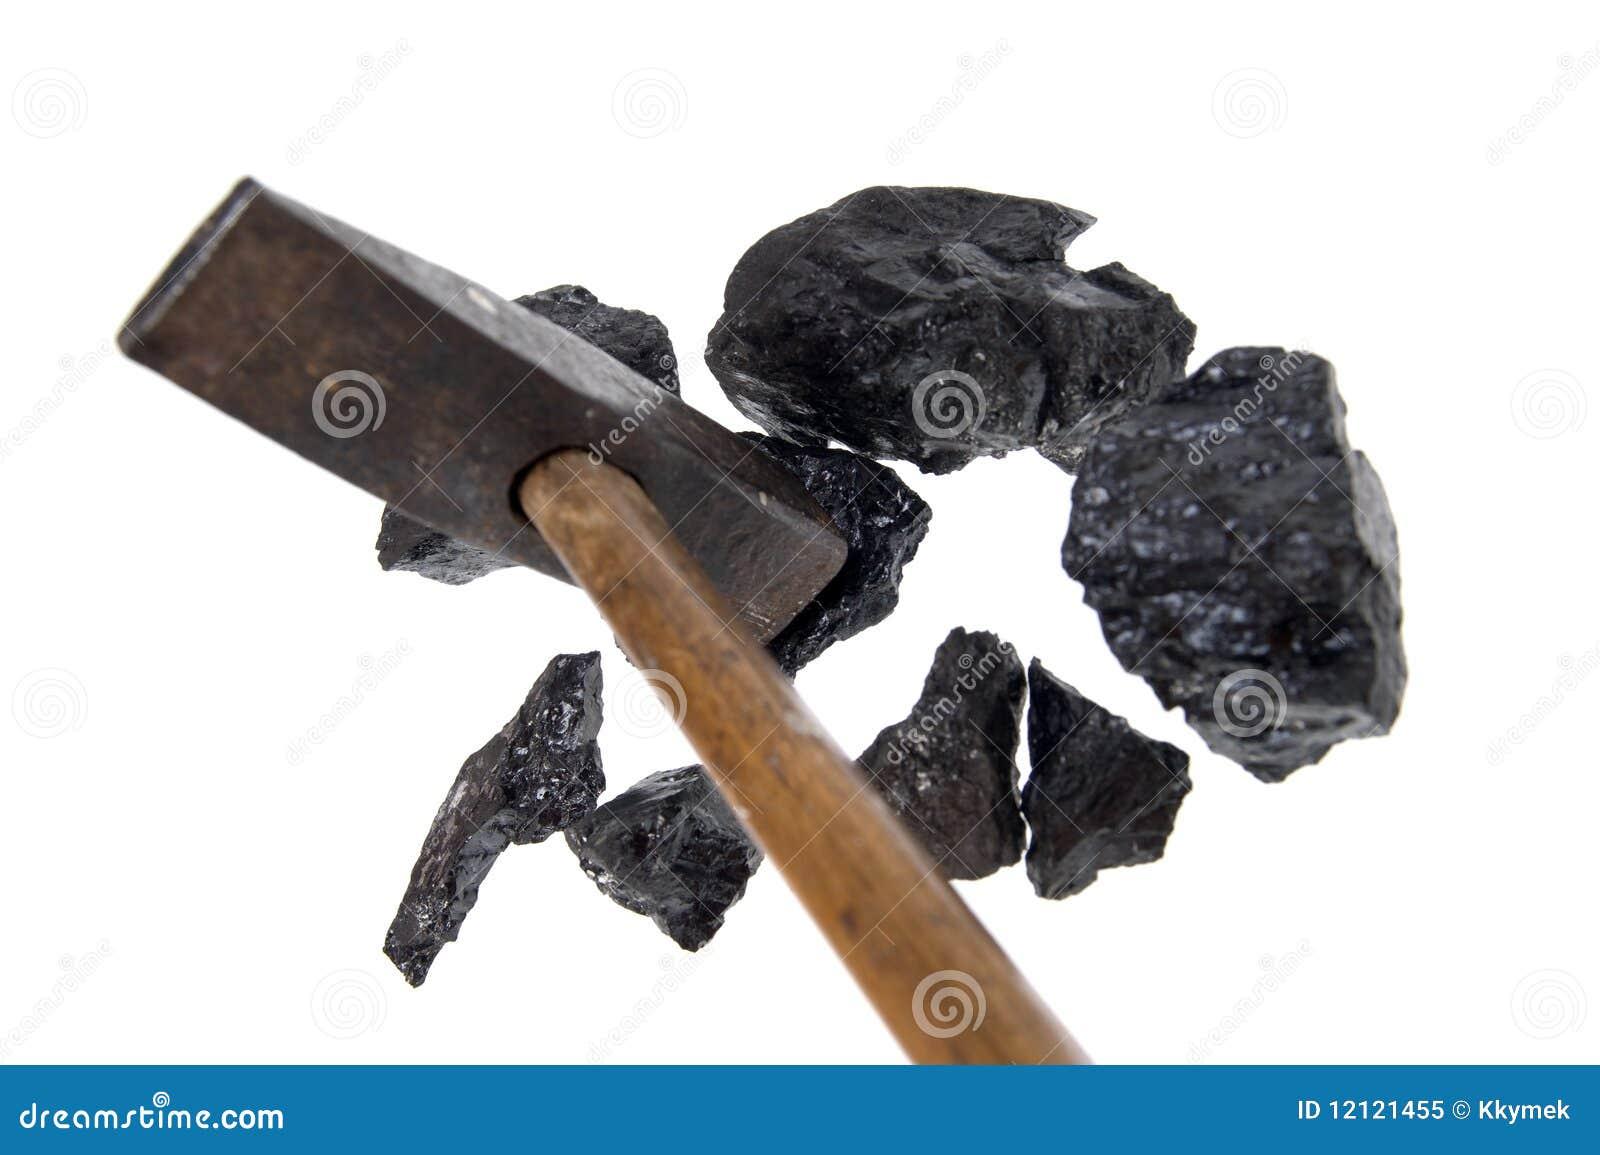 Getrennte Hammerkohle, Kohlenstoffnuggets